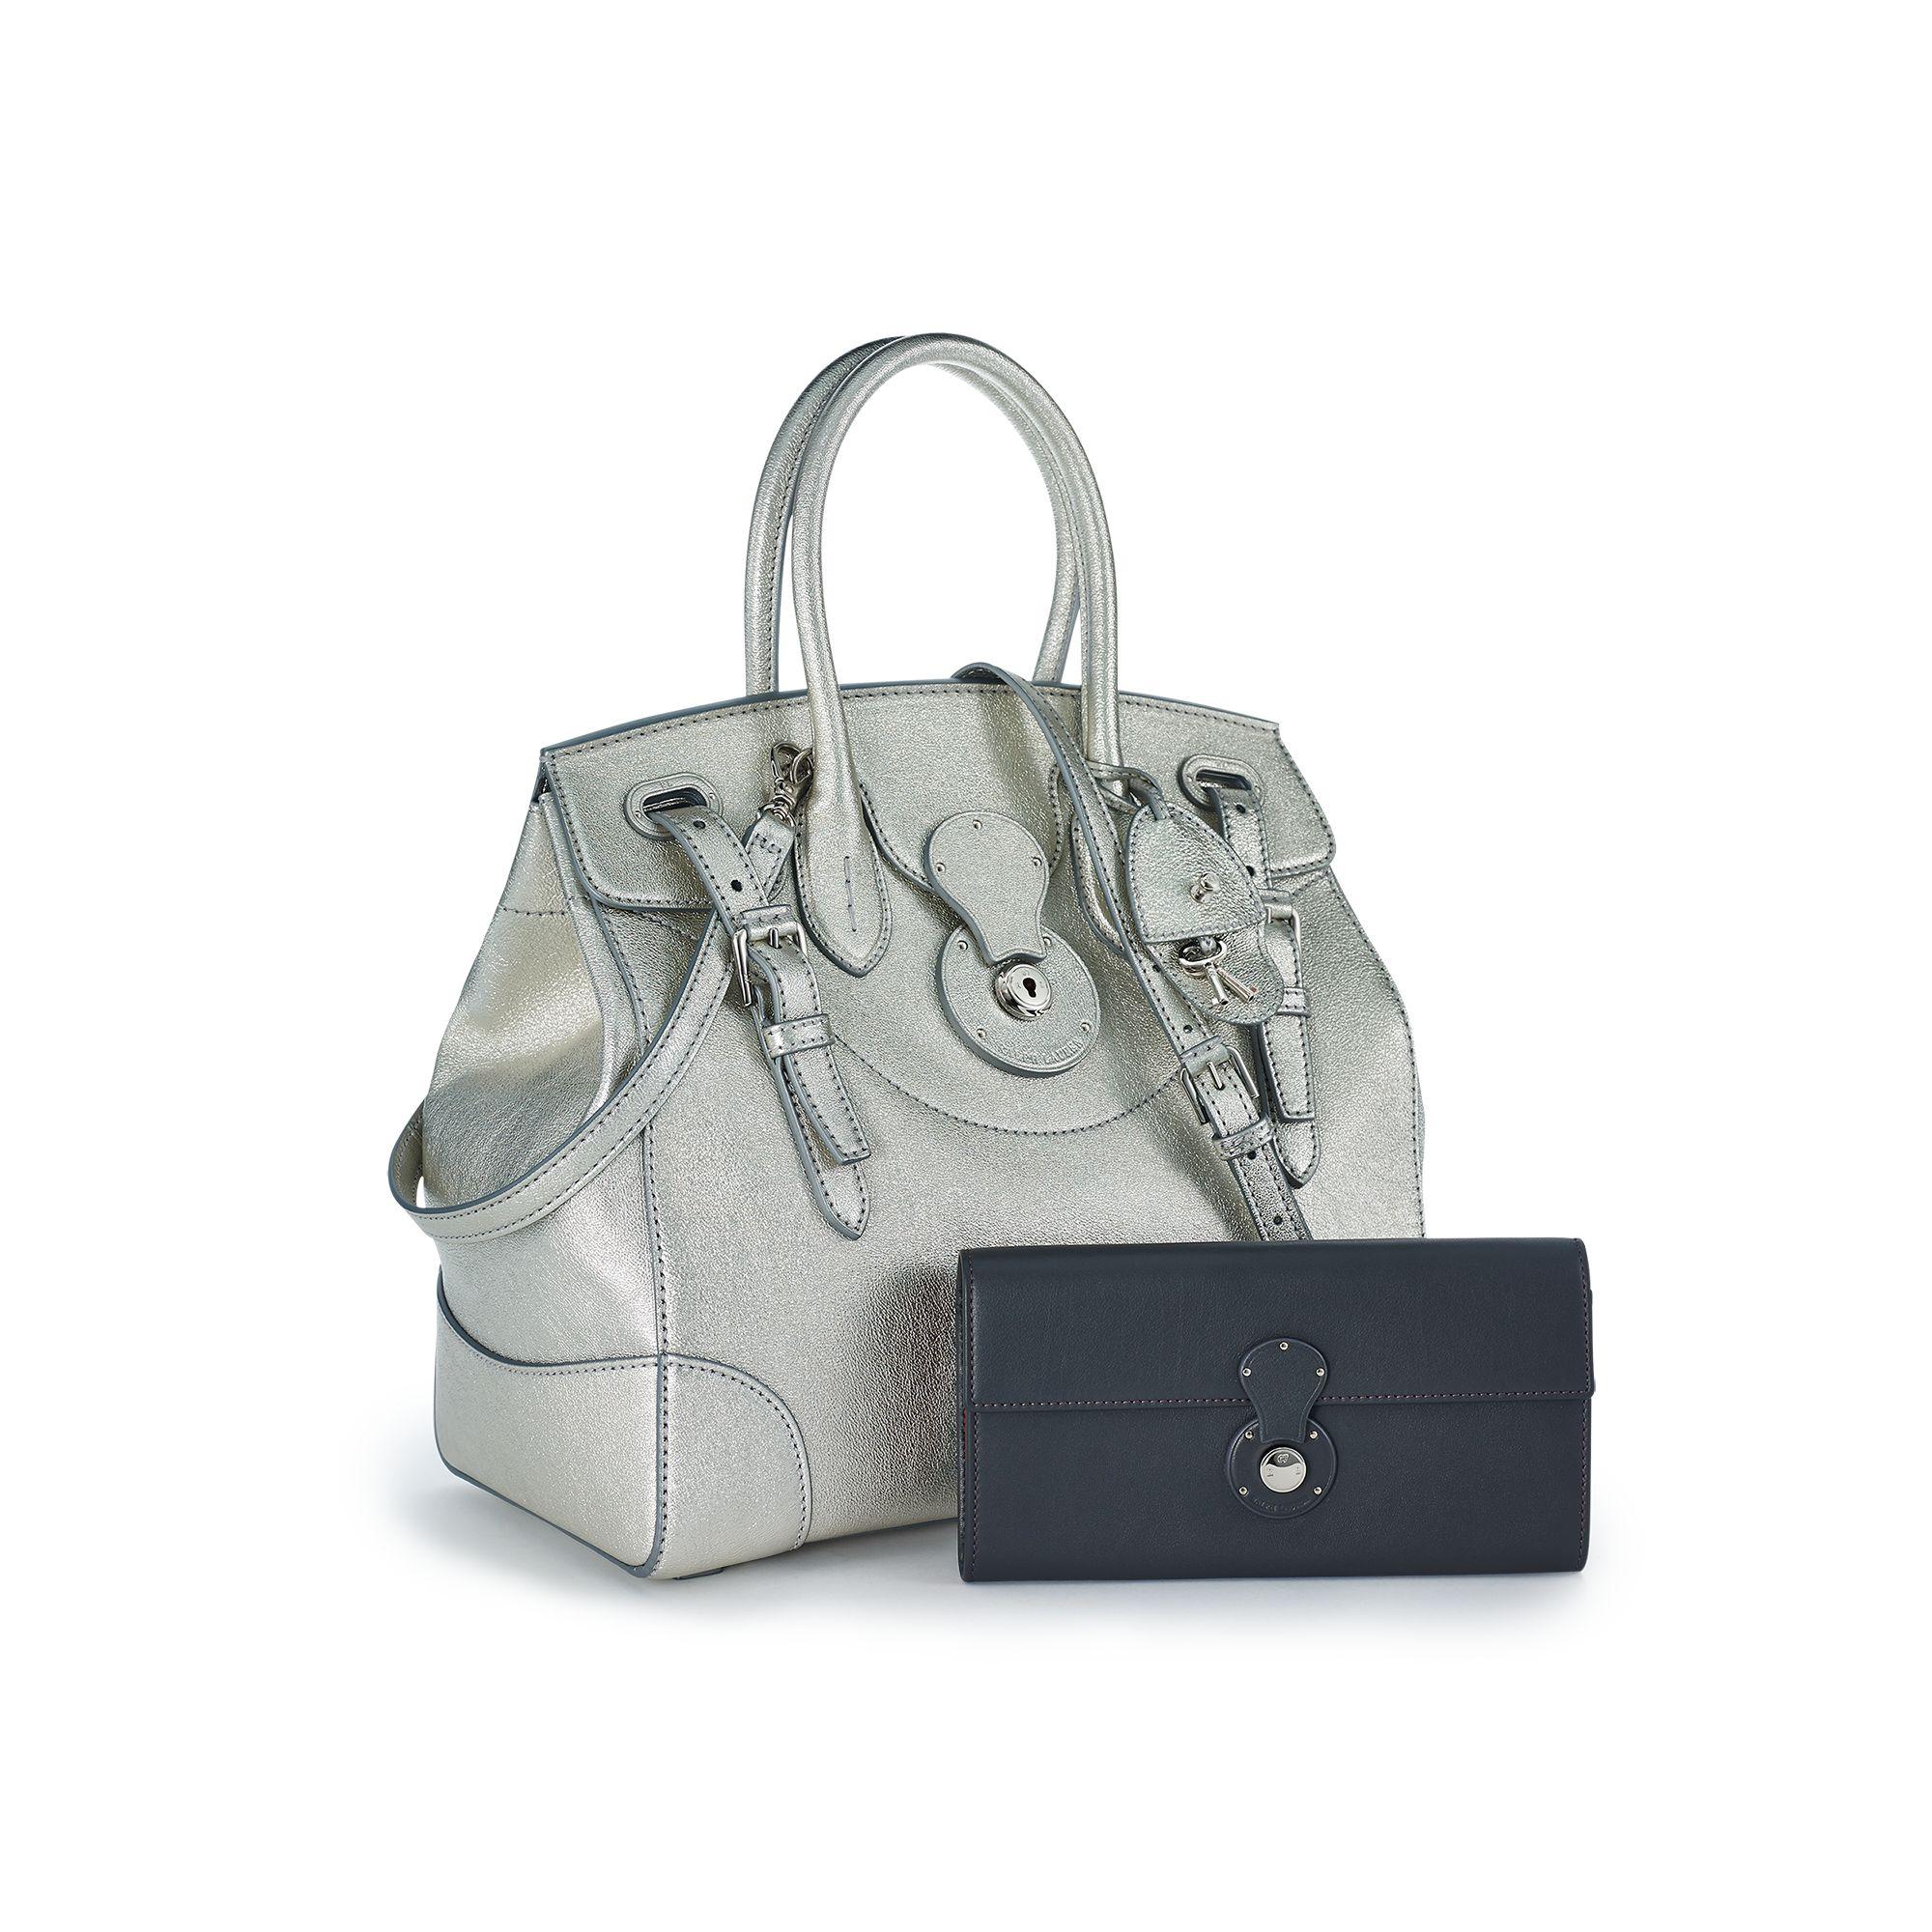 Pink Pony Metallic Soft Ricky Bag in Metallic - Lyst 3cc90cd3d1572